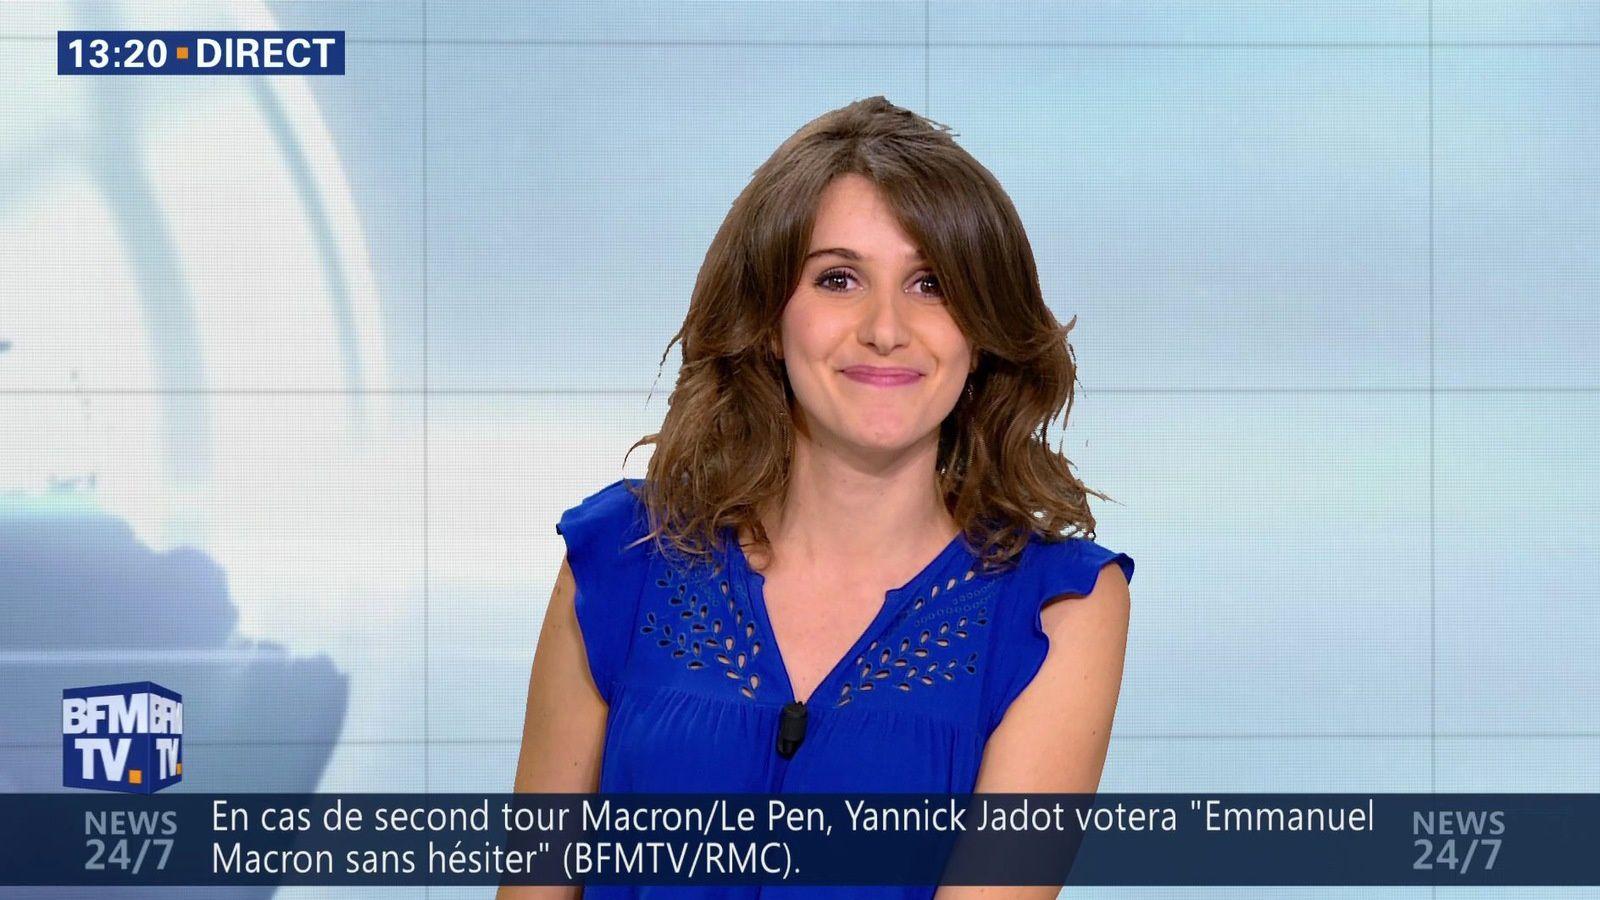 �9 �2 FANNY AGOSTINI @Fanny_Agostini pour LA METEO cet apm @bfmtv #vuesalatele